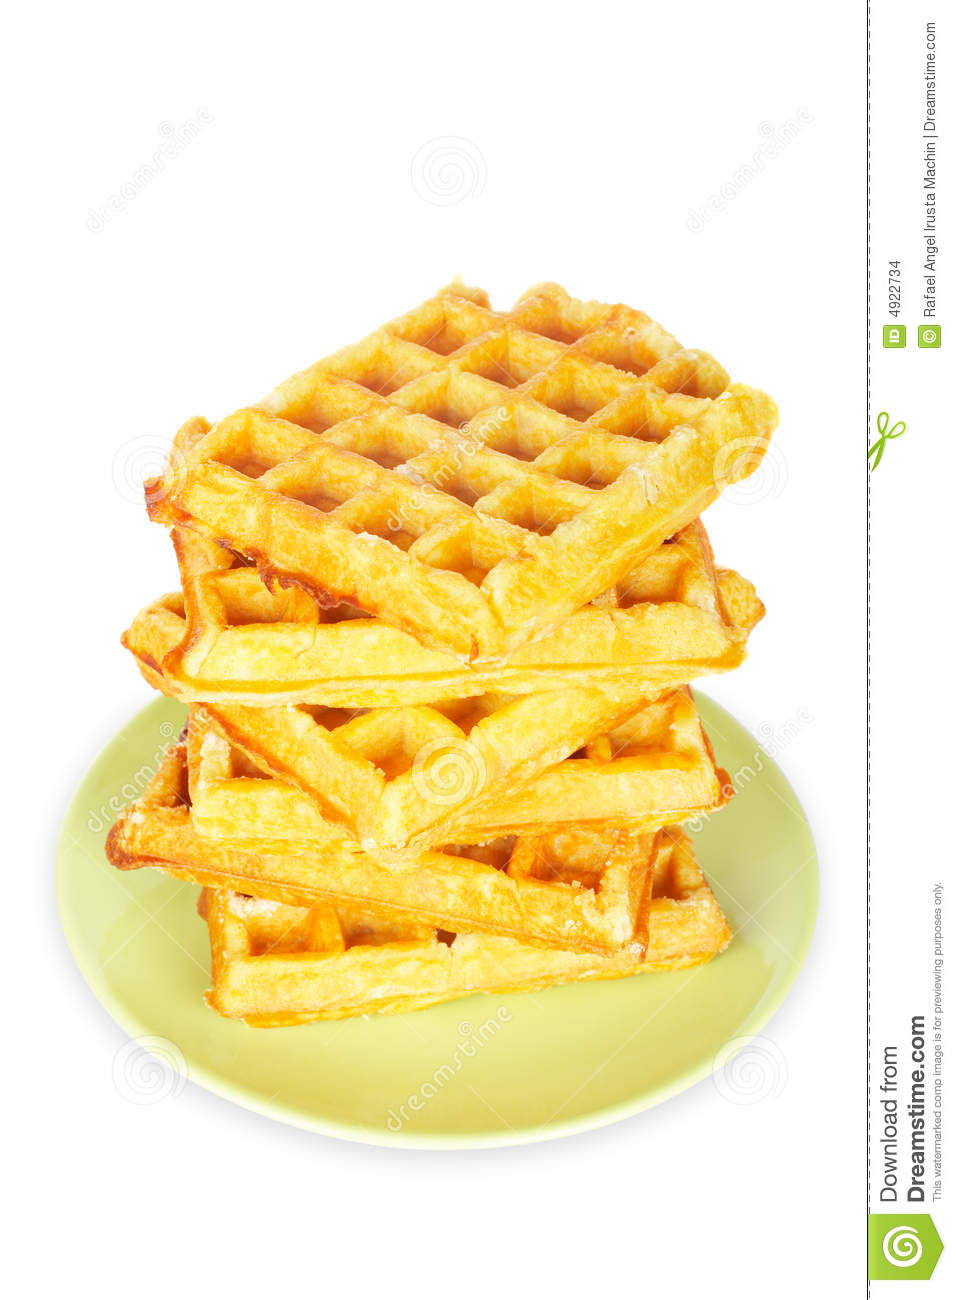 Waffle clipart pile Waffles waffle (81+) Clipart art